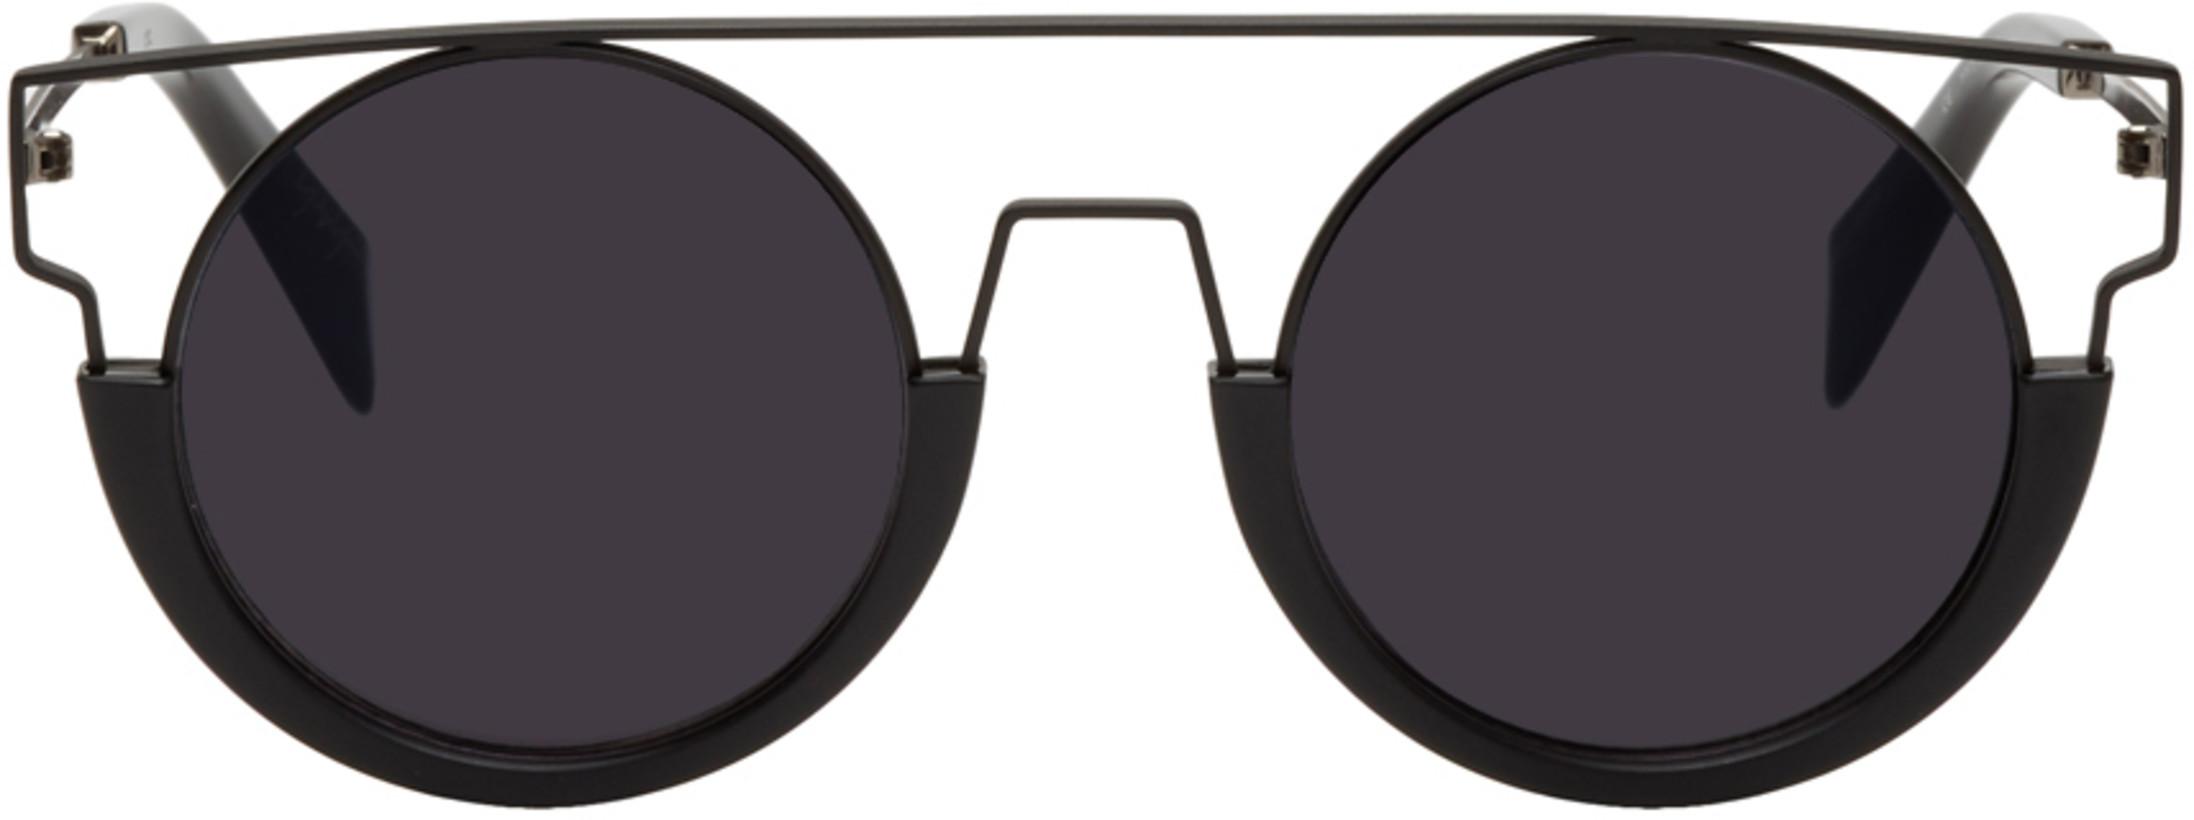 Yohji Yamamoto Black Round Wire Frame Sunglasses